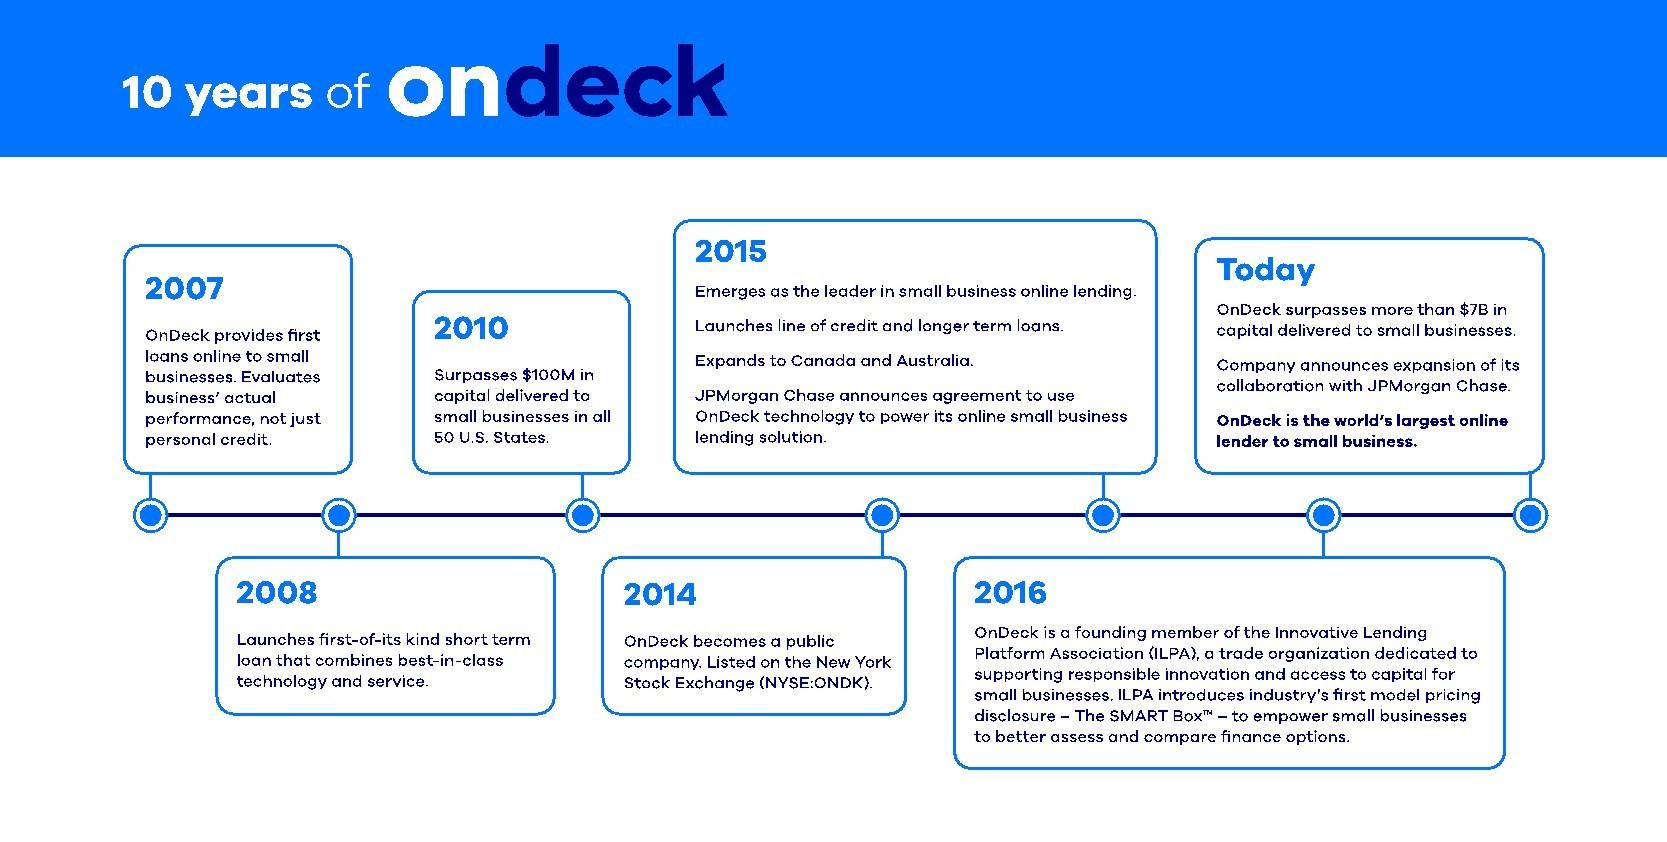 Ten years of OnDeck innovation.